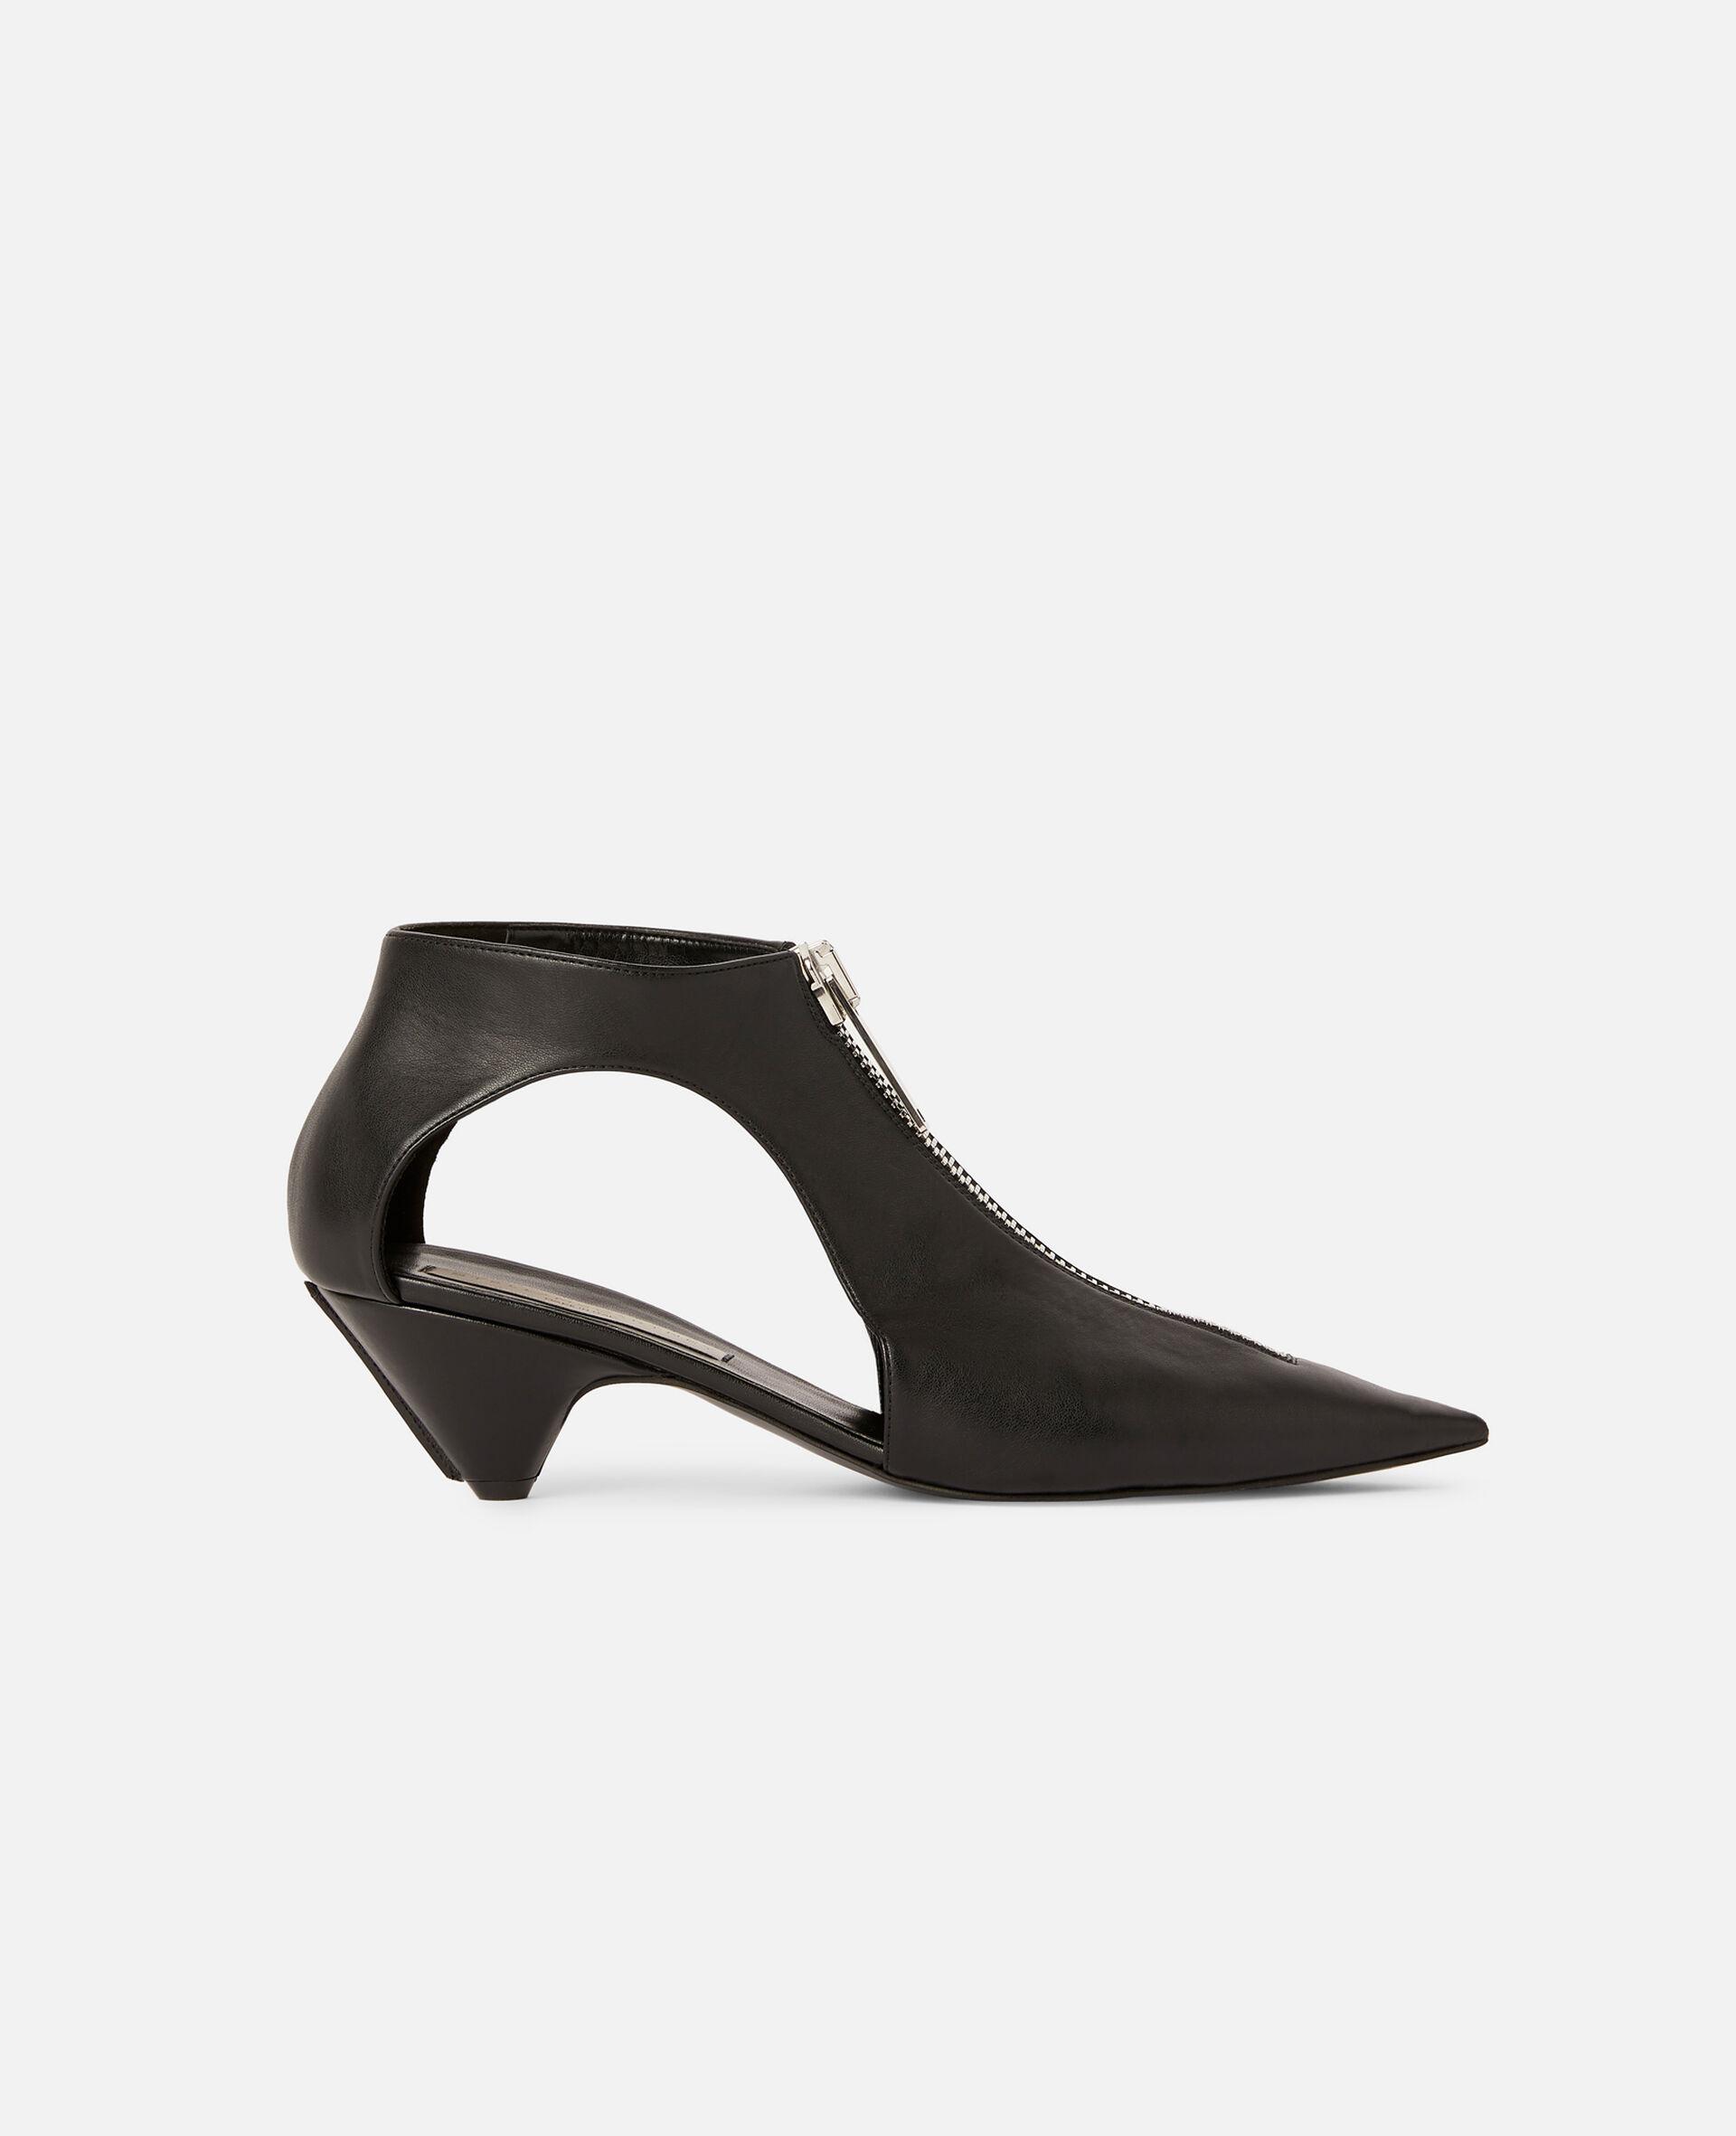 Zipit Low Heel Boots-Black-large image number 0